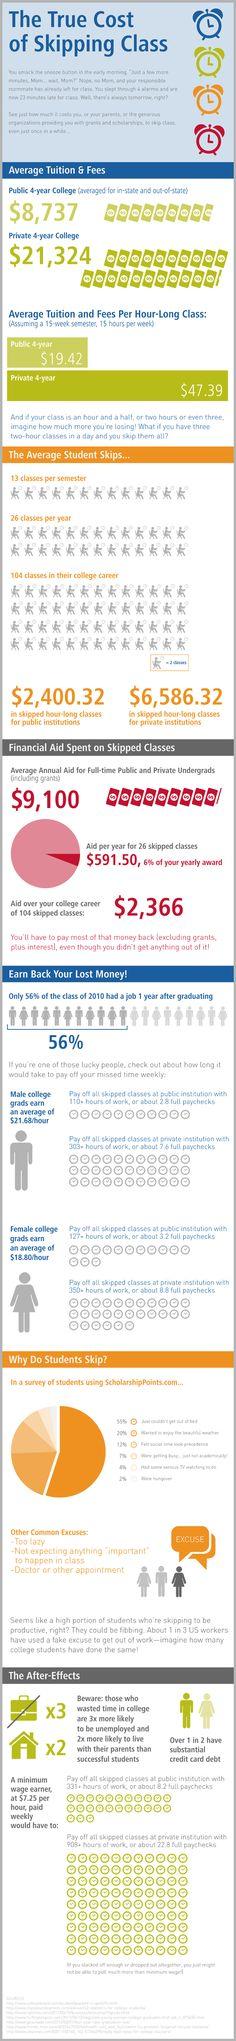 El brutal coste de faltar a clase #infografia #infographic #education